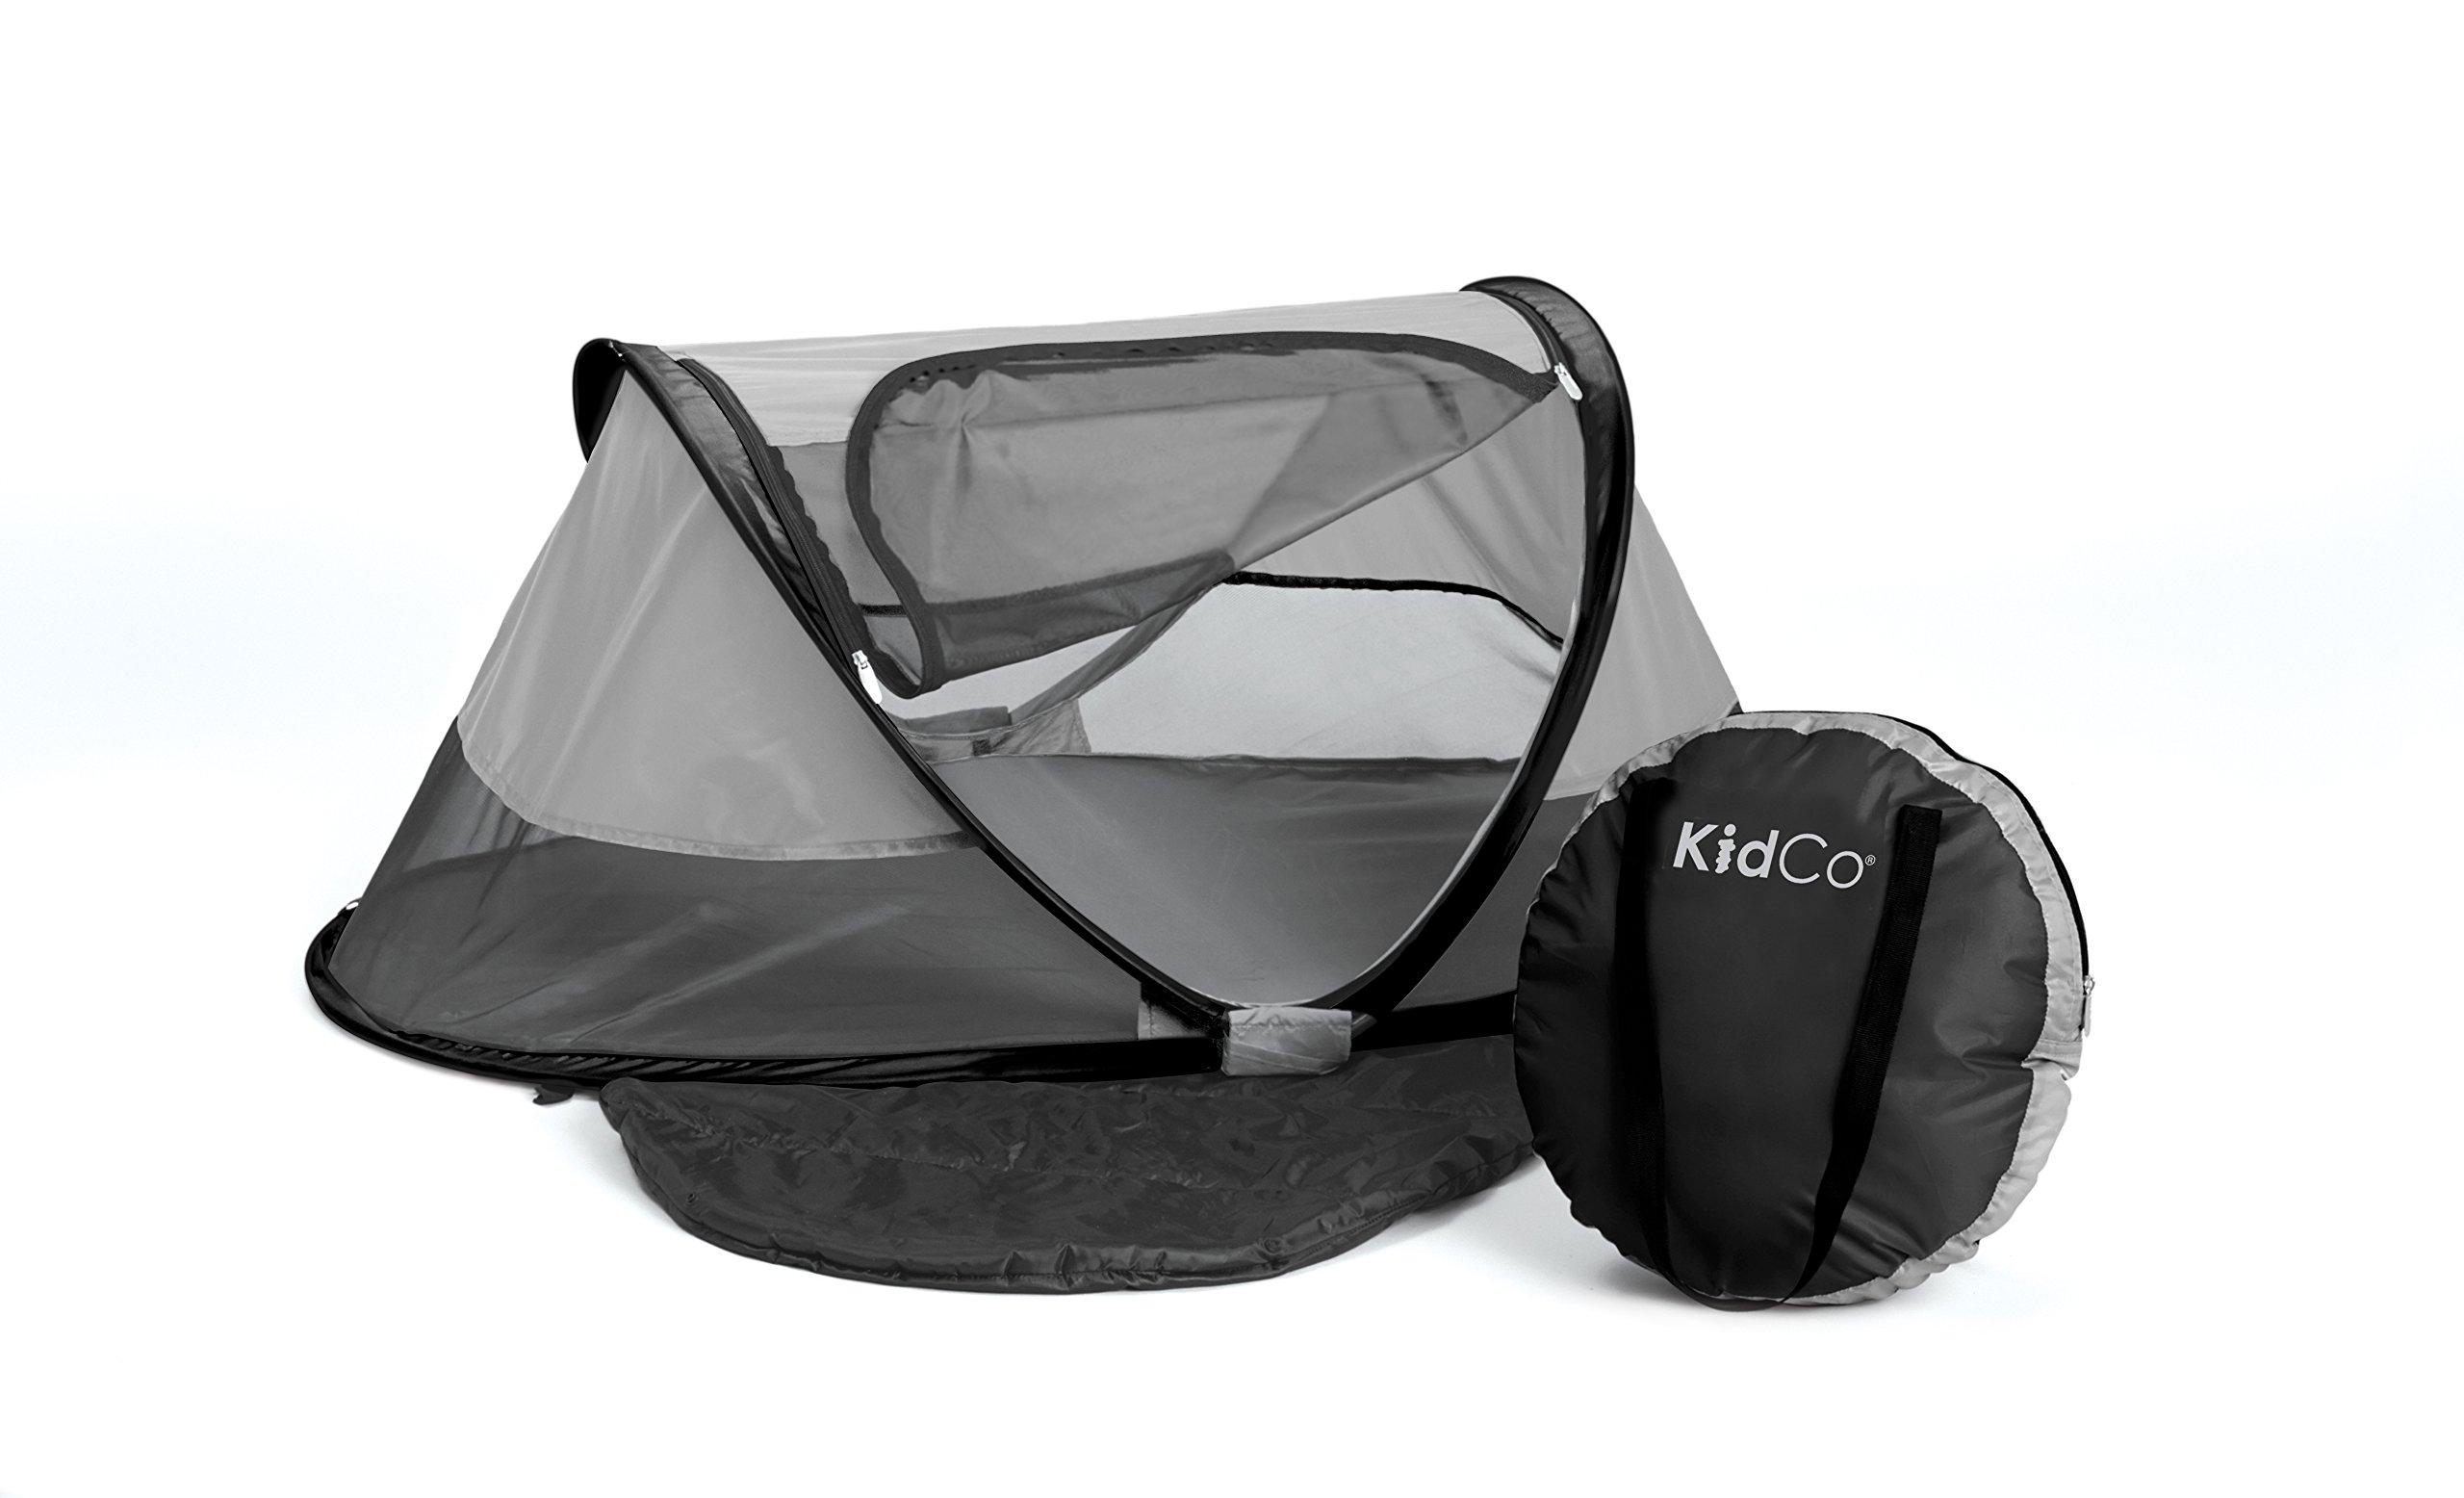 KidCo P3012 PeaPod Infant Travel Bed, Midnight